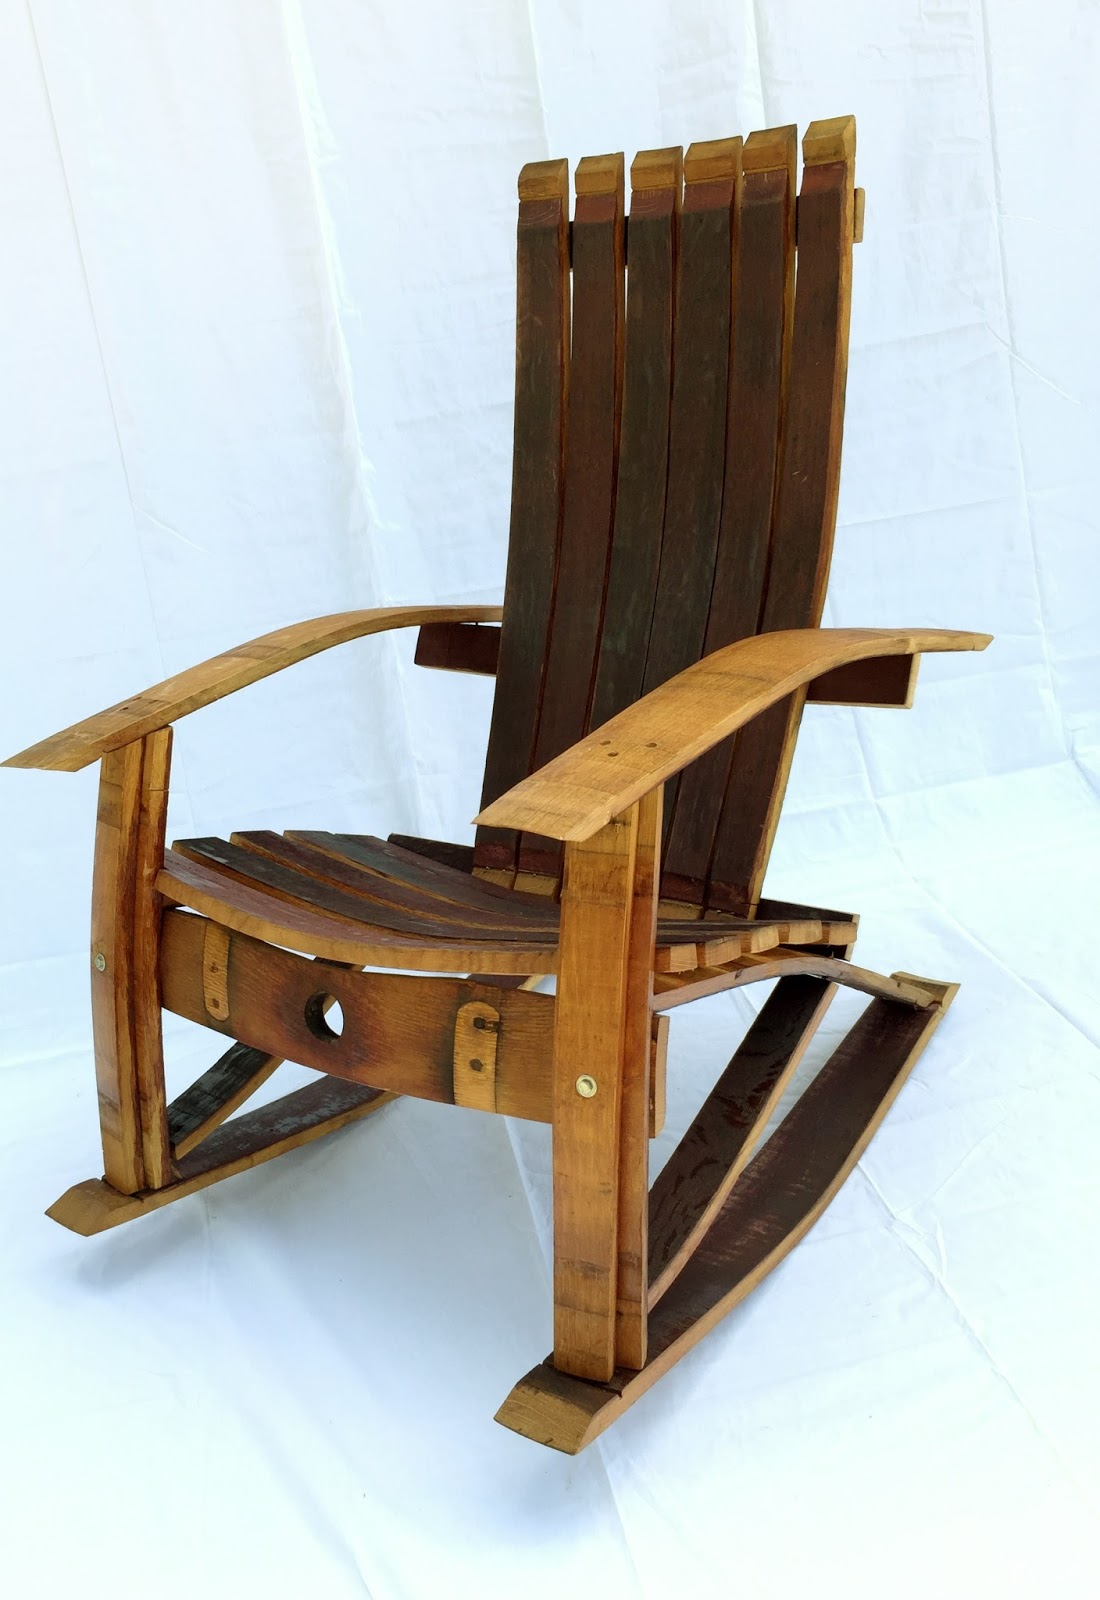 Wine barrel rocking chair - Wine Barrel Adirondack Rocking Chair Measures 43 H X 28 W X 41 L